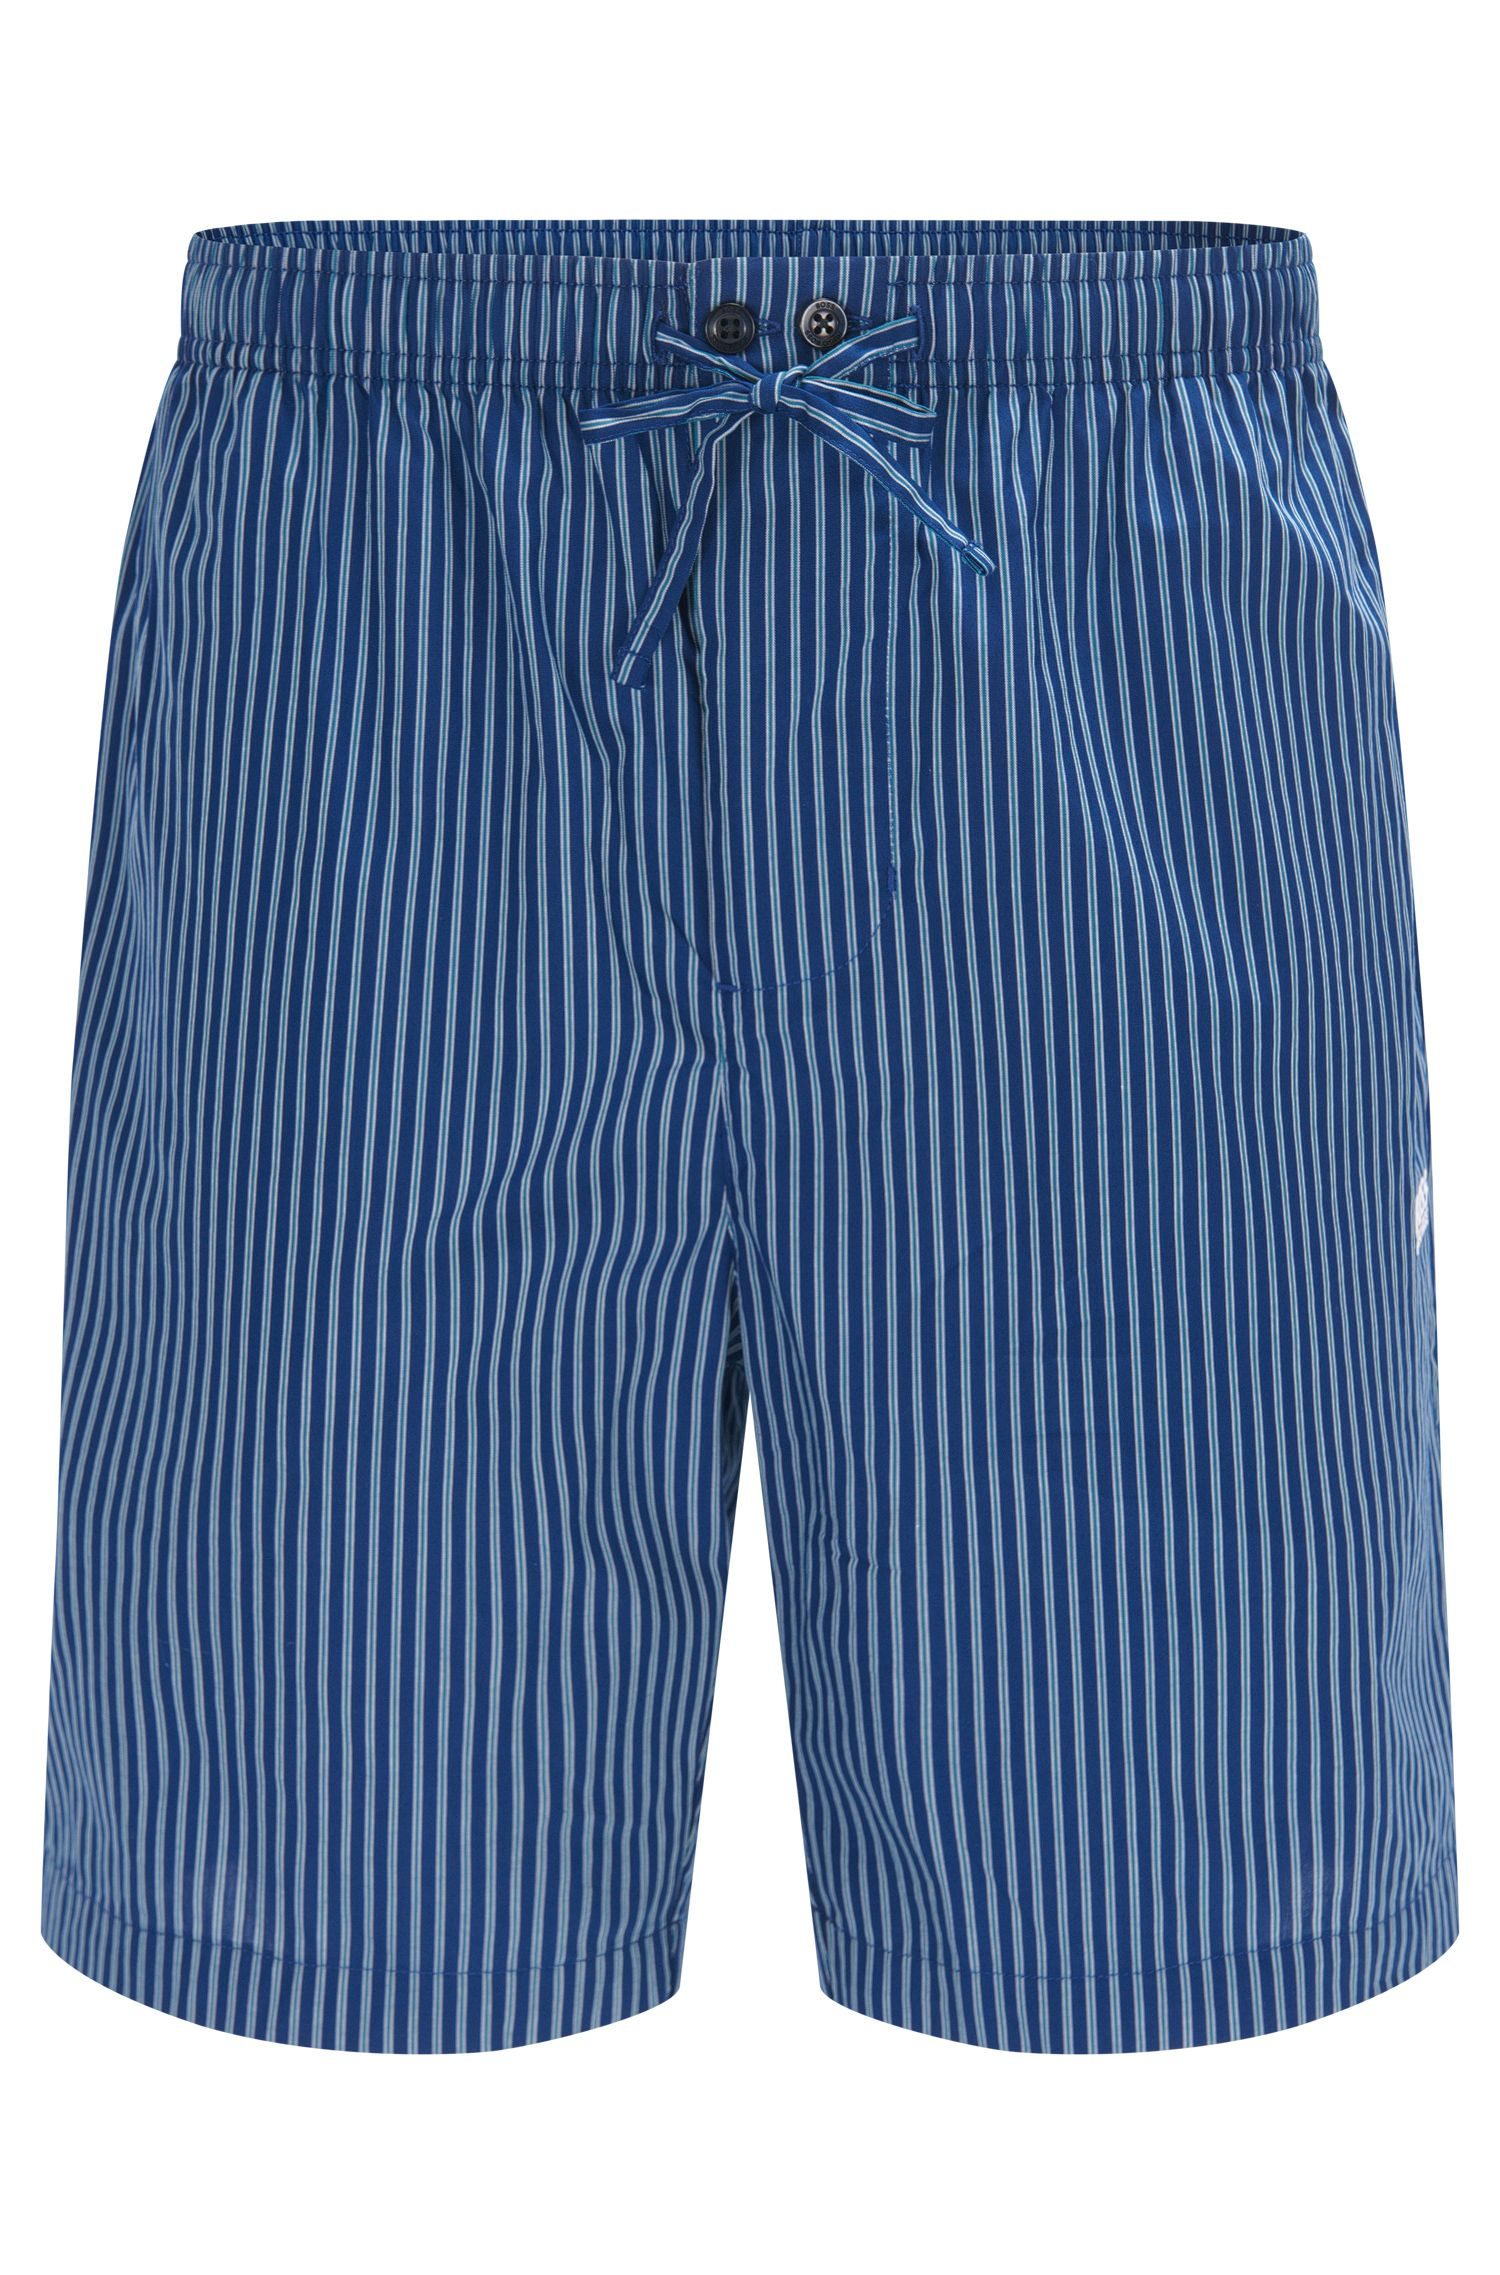 Gestreifte Pyjama-Shorts aus Baumwoll-Popeline